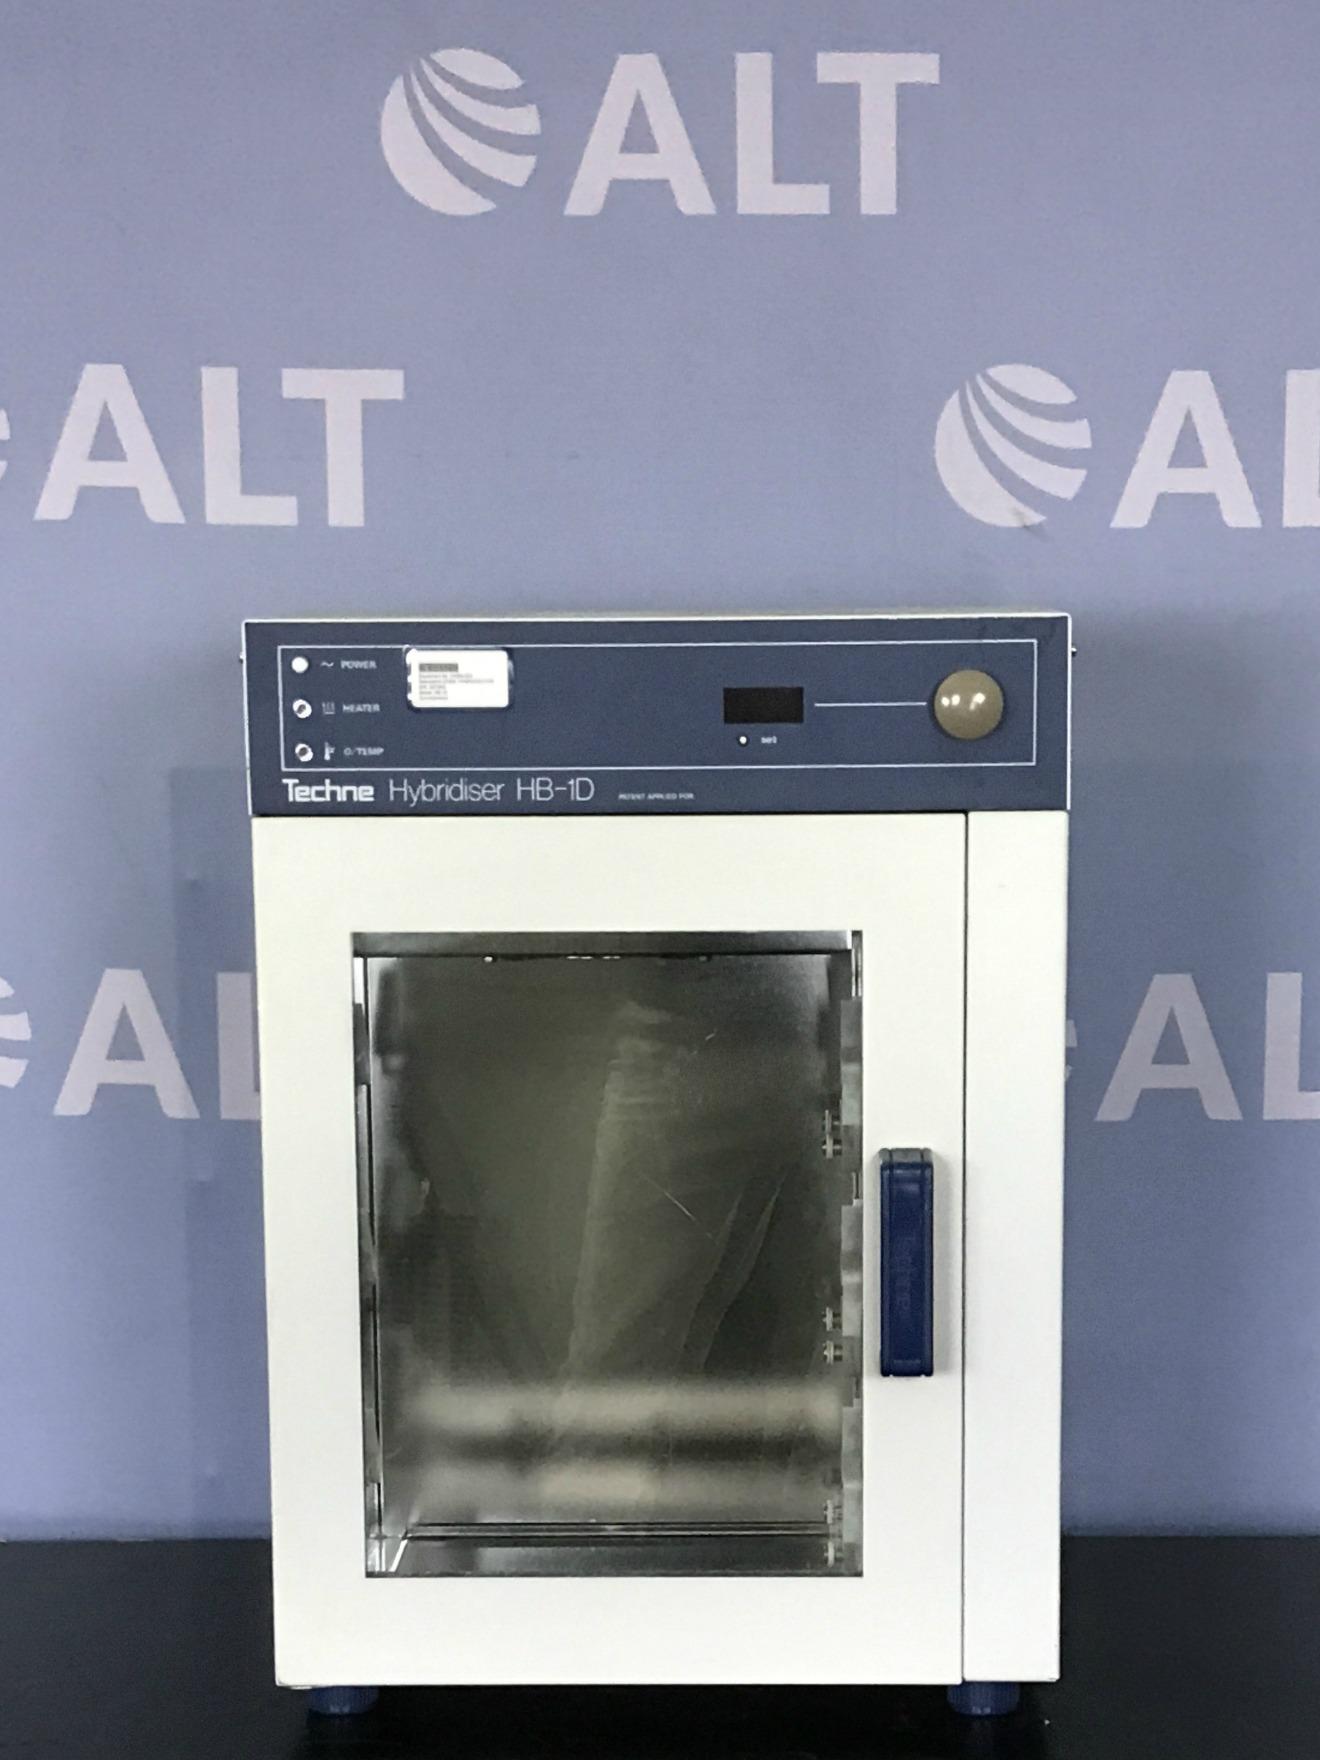 Techne Hybridiser HB-1D Image